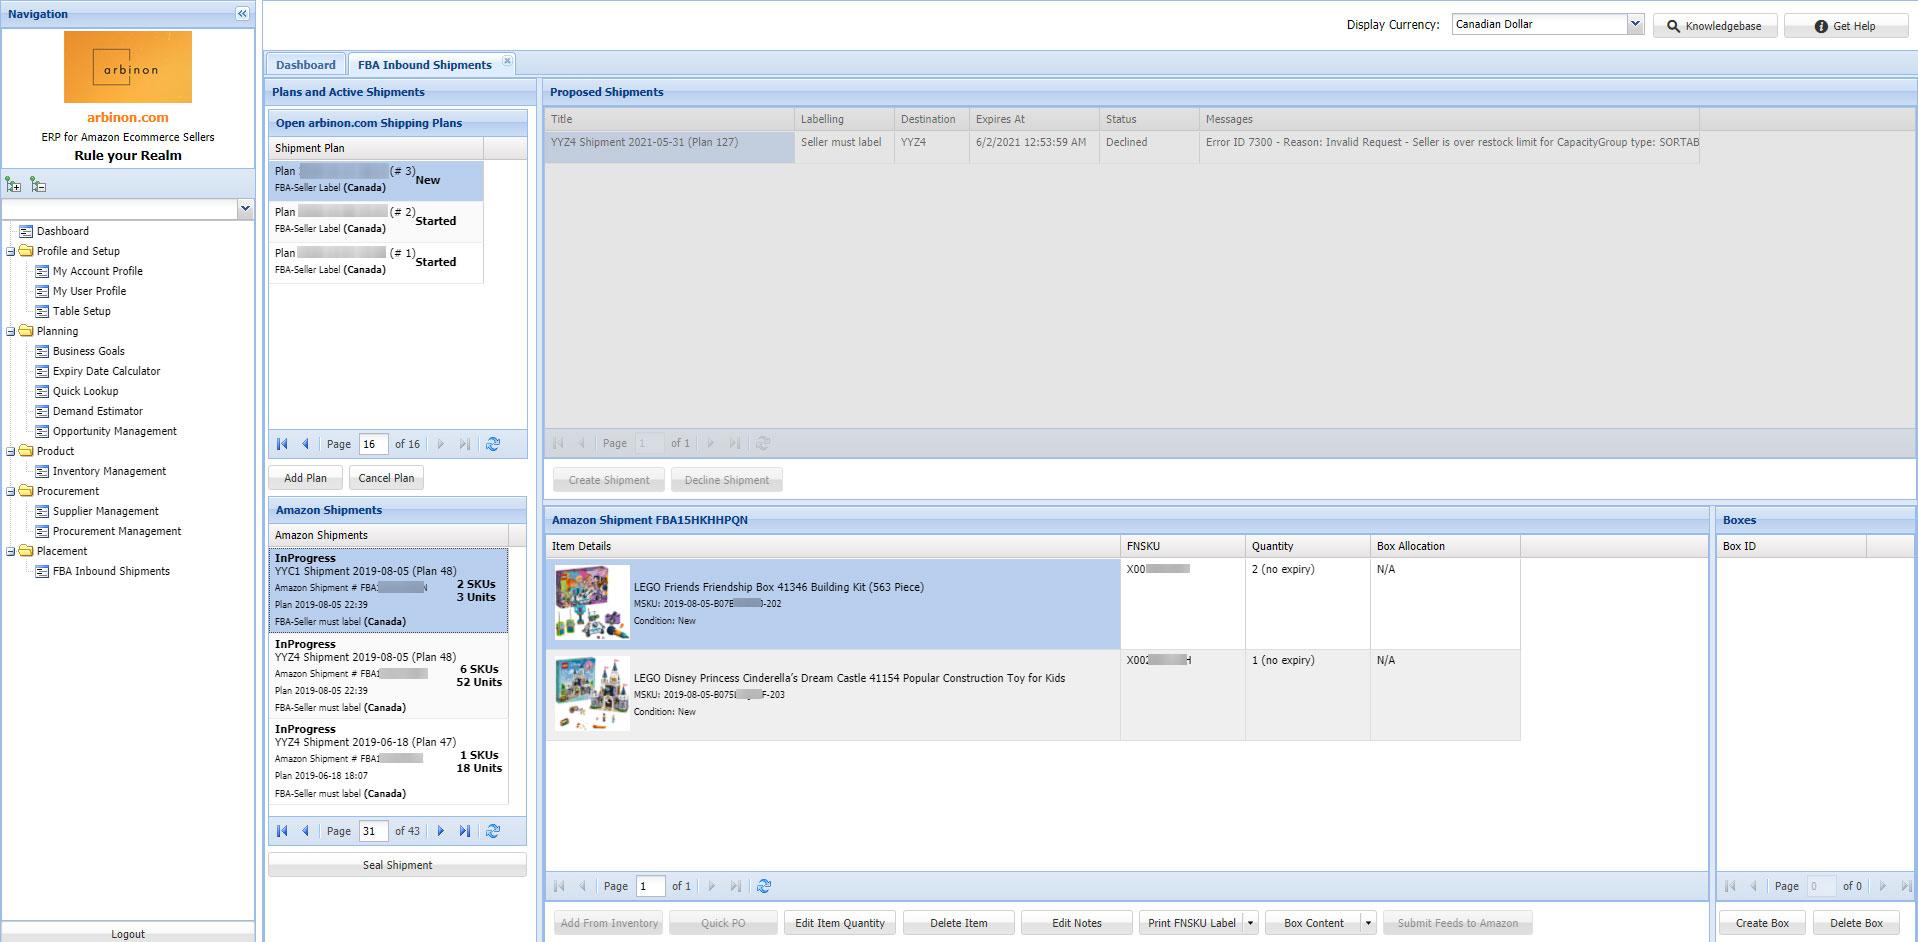 arbinon.com_amazon_fba_inbound_shipment_creation_box_content_amazon_fba